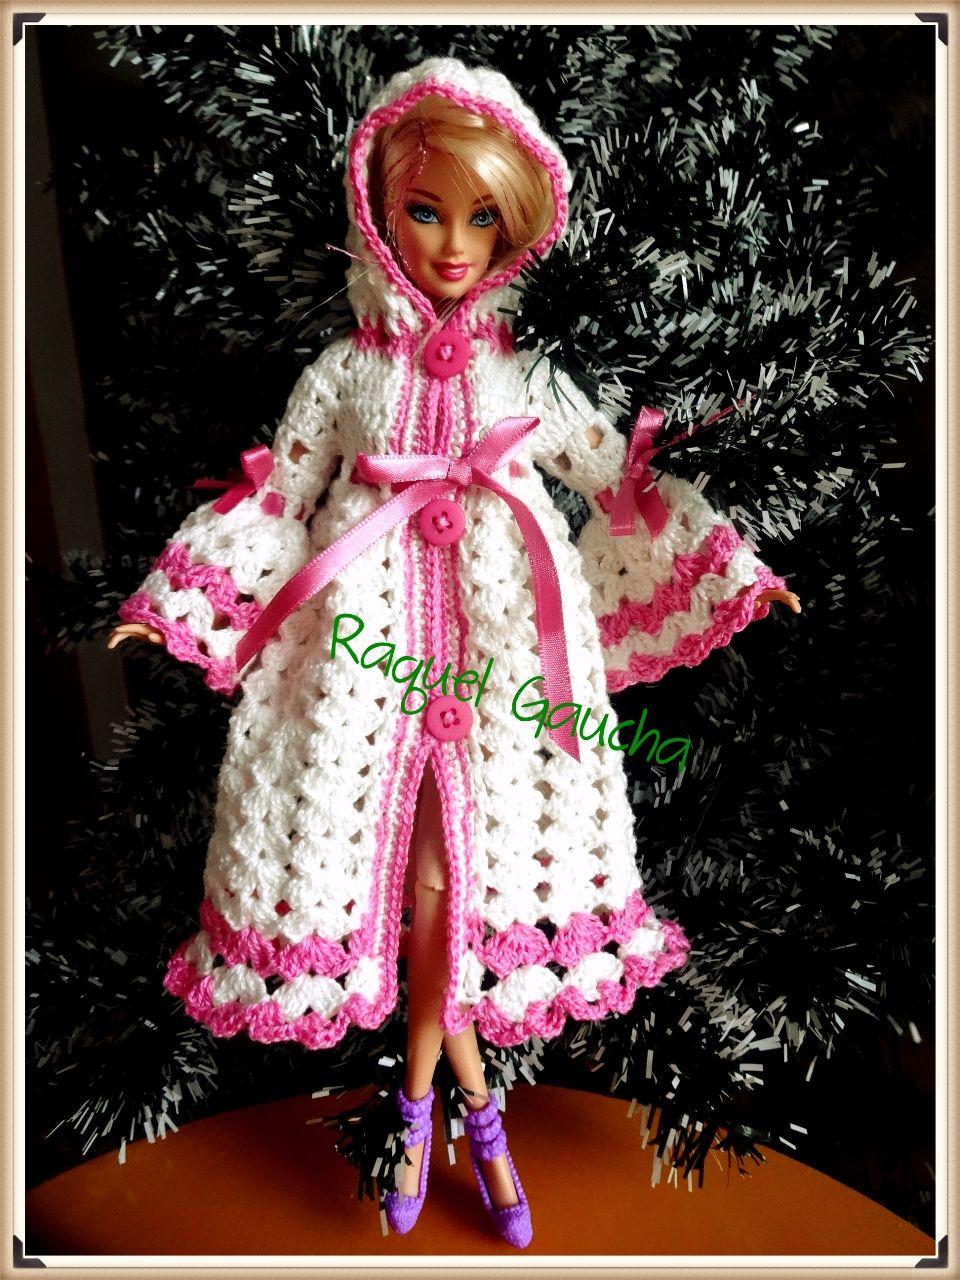 #Barbie #Doll #Roupão #Crochet #Cléa5 #RaquelGaucha